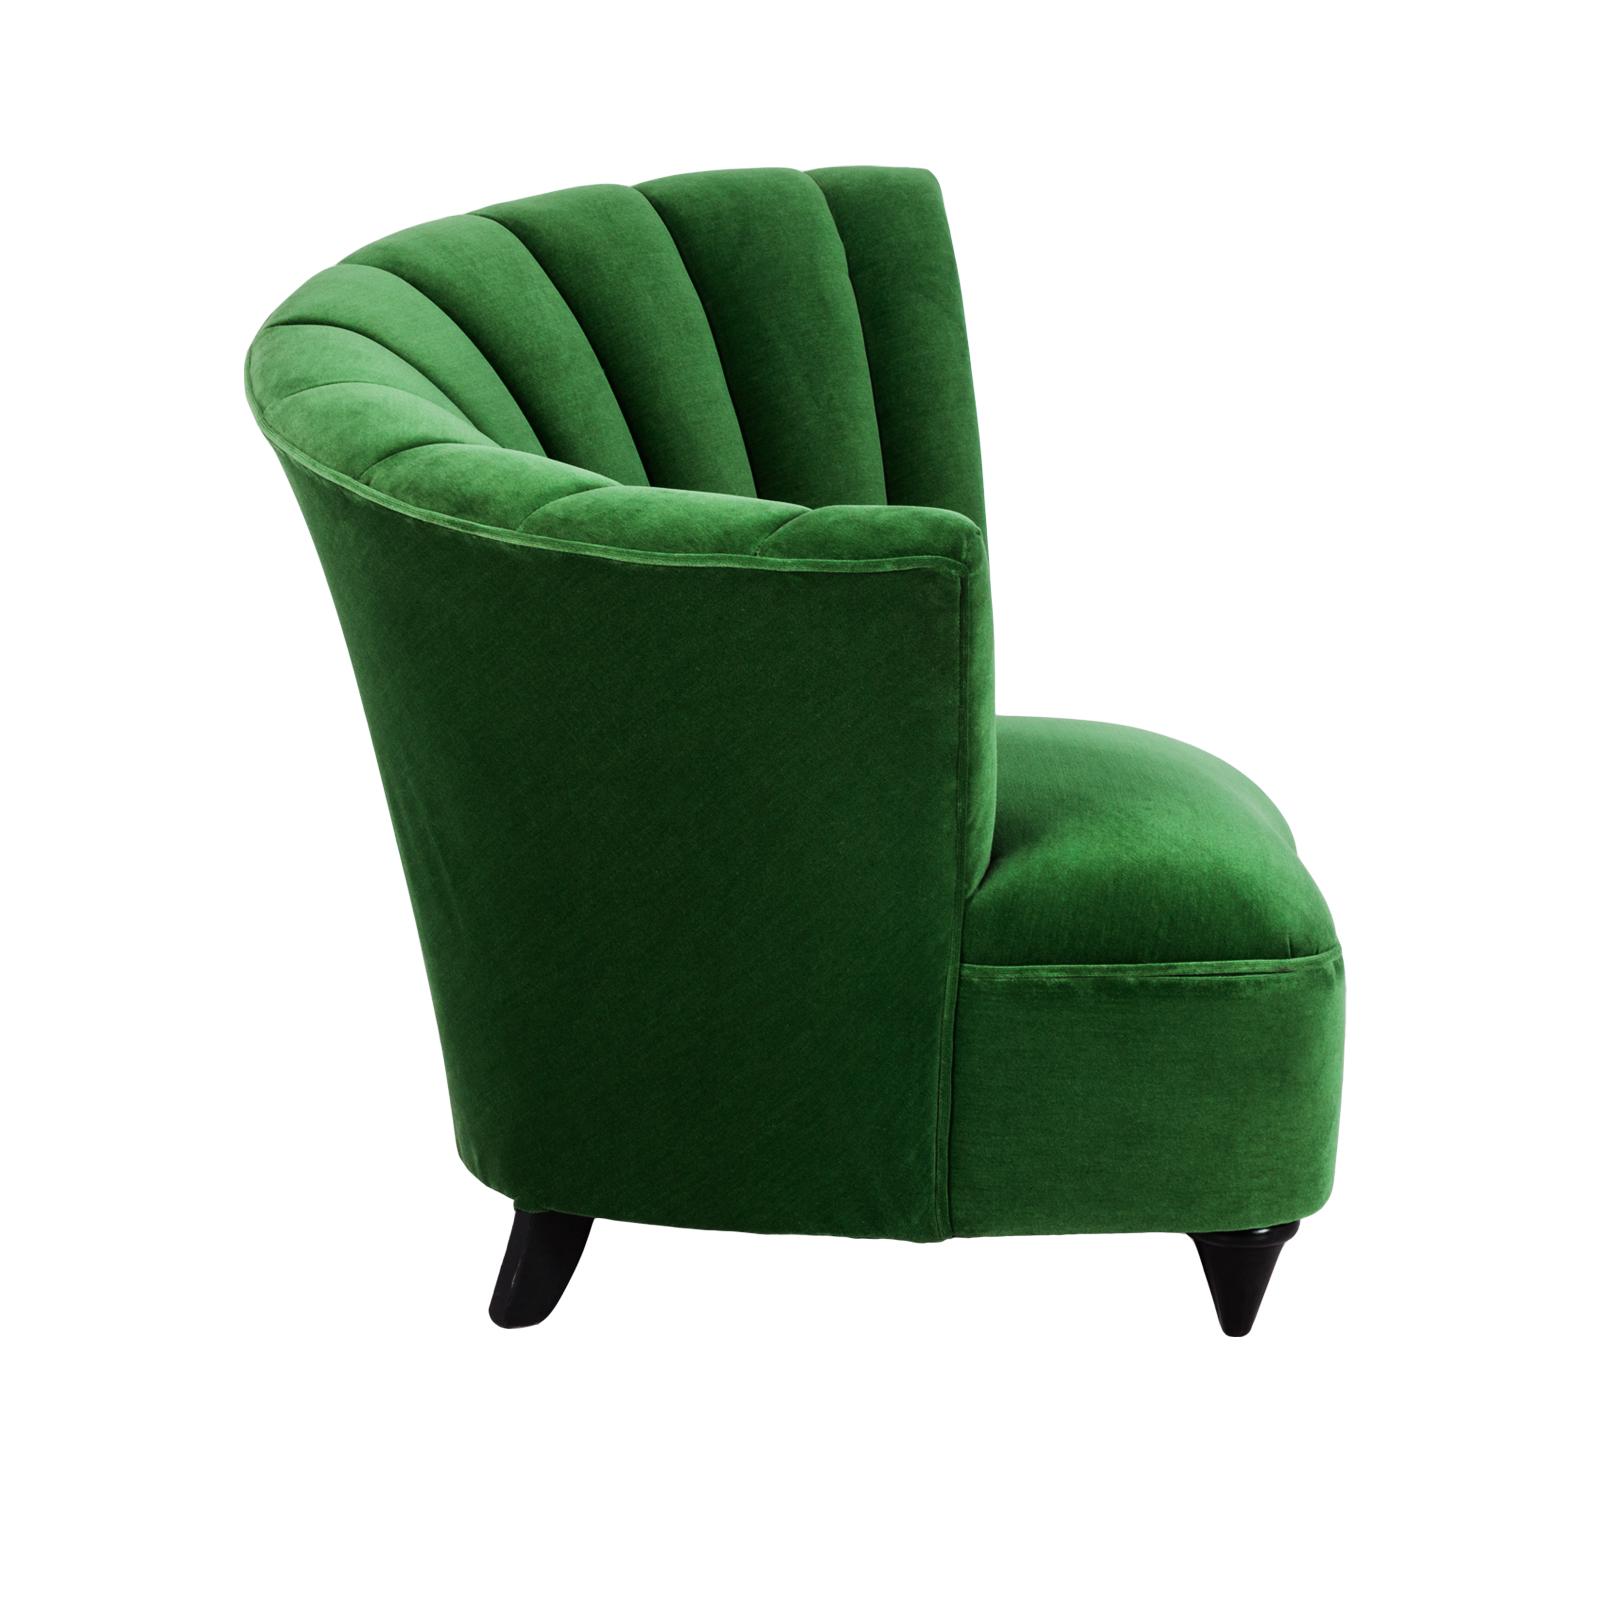 Calla Lily Chair Rentals Event Furniture Rental